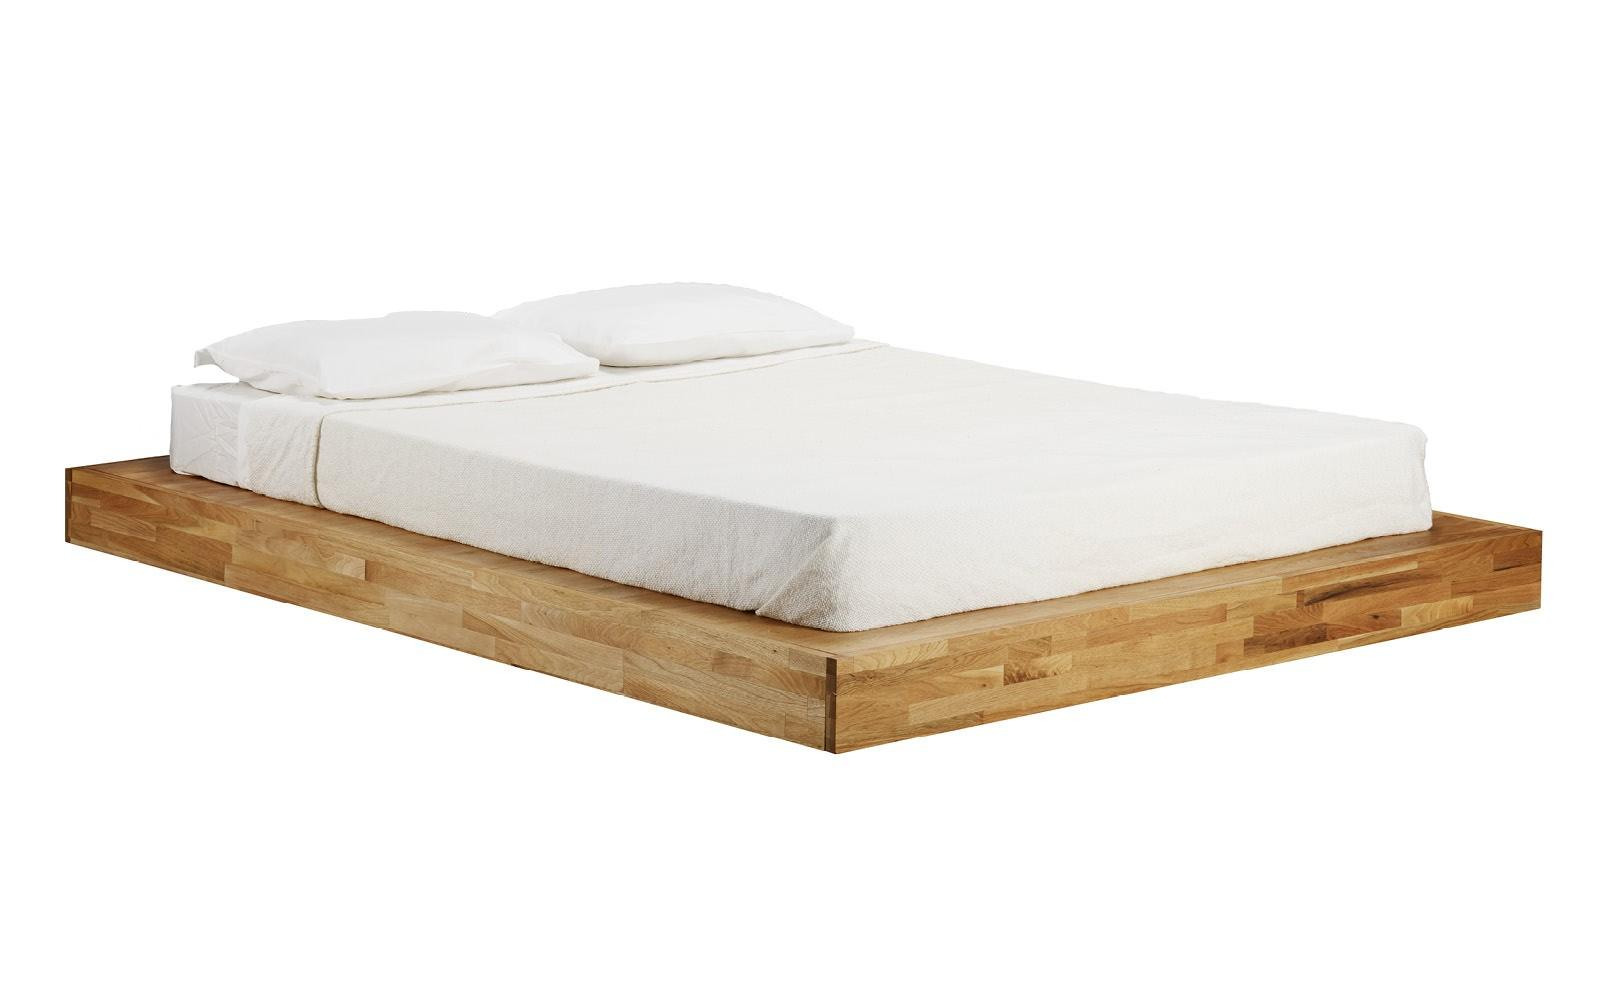 Offer Khuyến Mãi GIƯỜNG NGỦ SÀN KIỂU NHẬT BD003 - Japanese Style Platform Bed